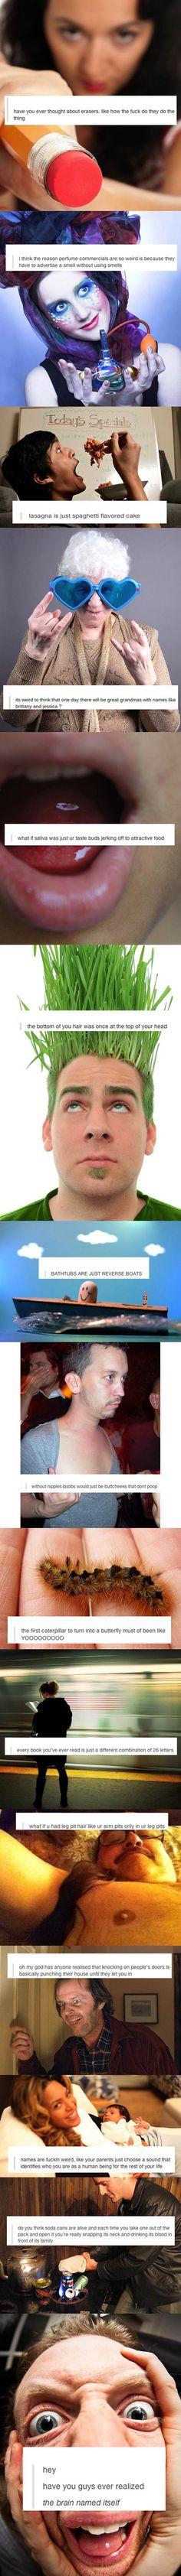 When the Internet gets deep…